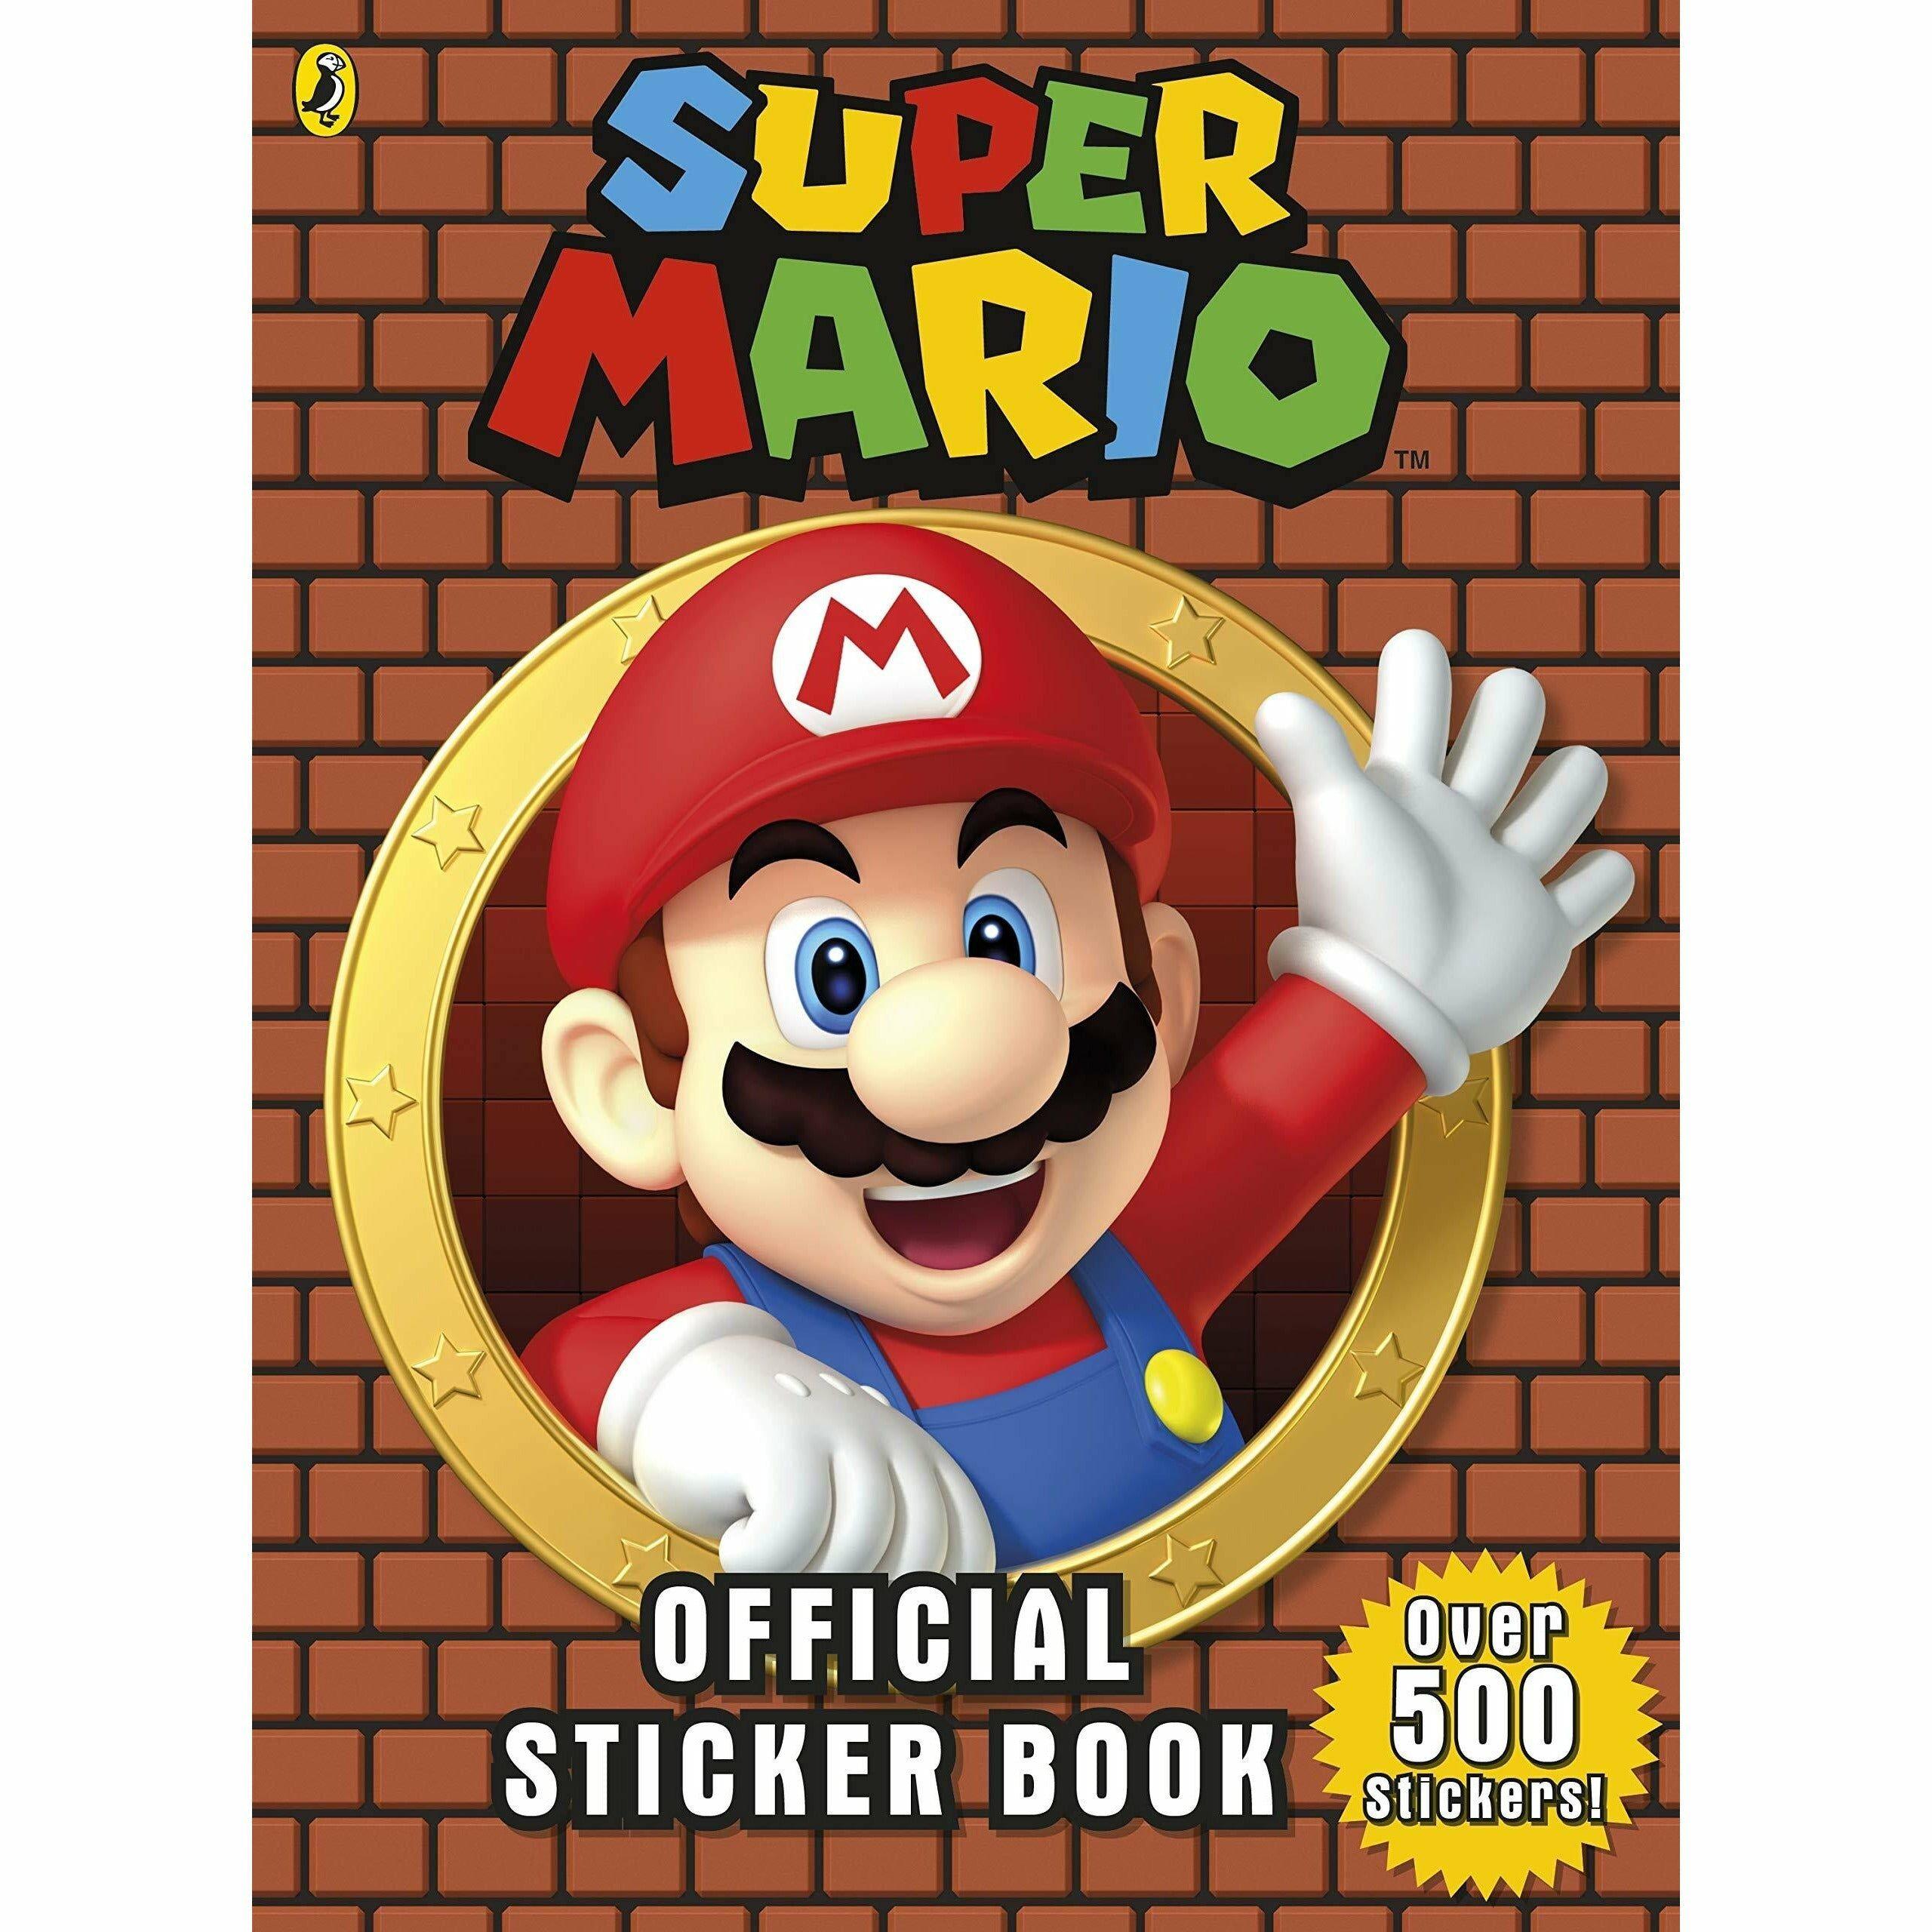 Puffin Super Mario: Official Sticker Book